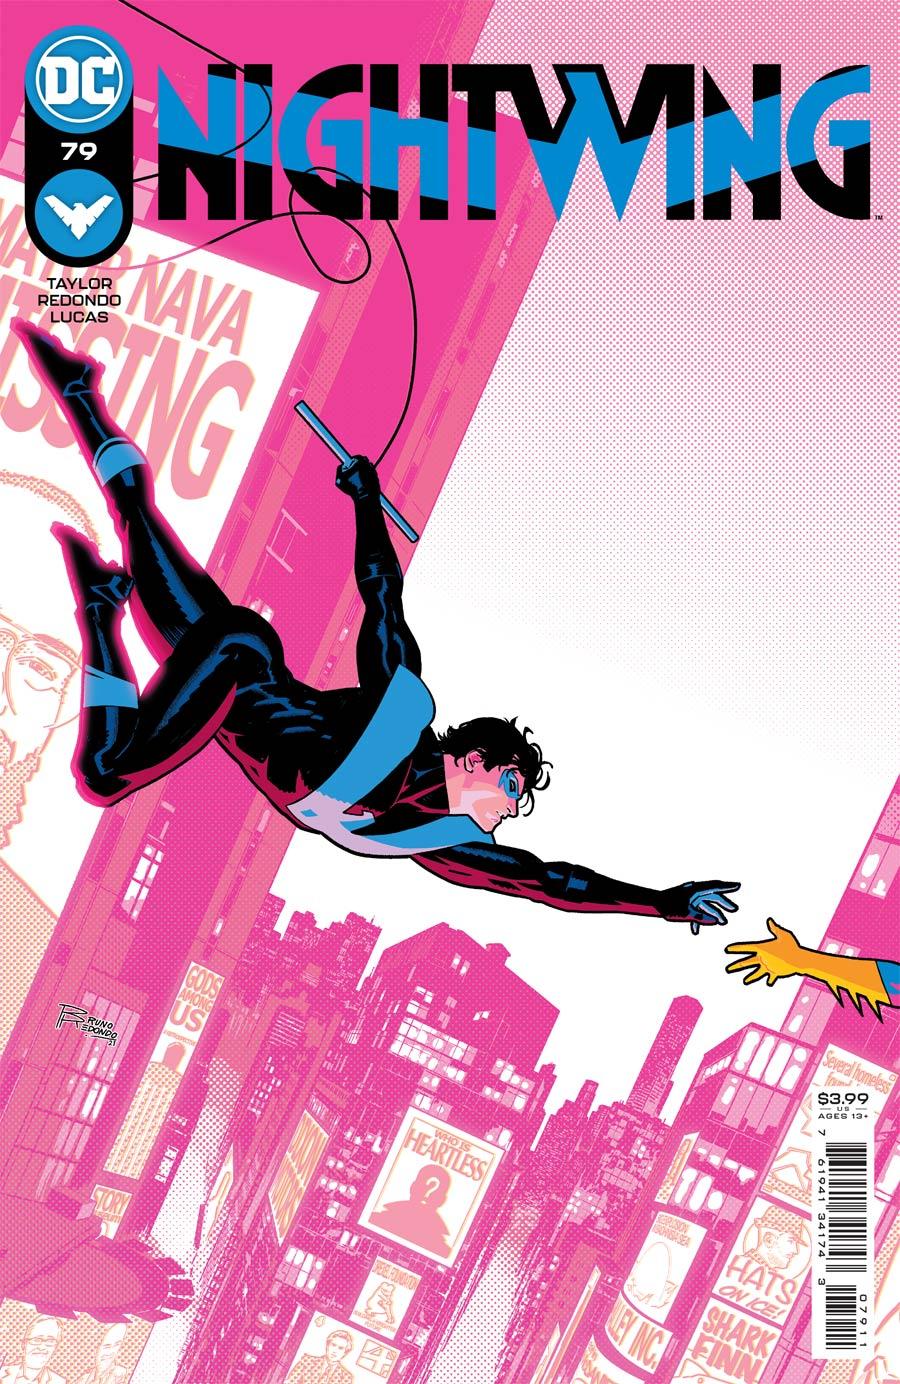 Nightwing Vol 4 #79 Cover A Regular Bruno Redondo Cover (Limit 1 Per Customer)